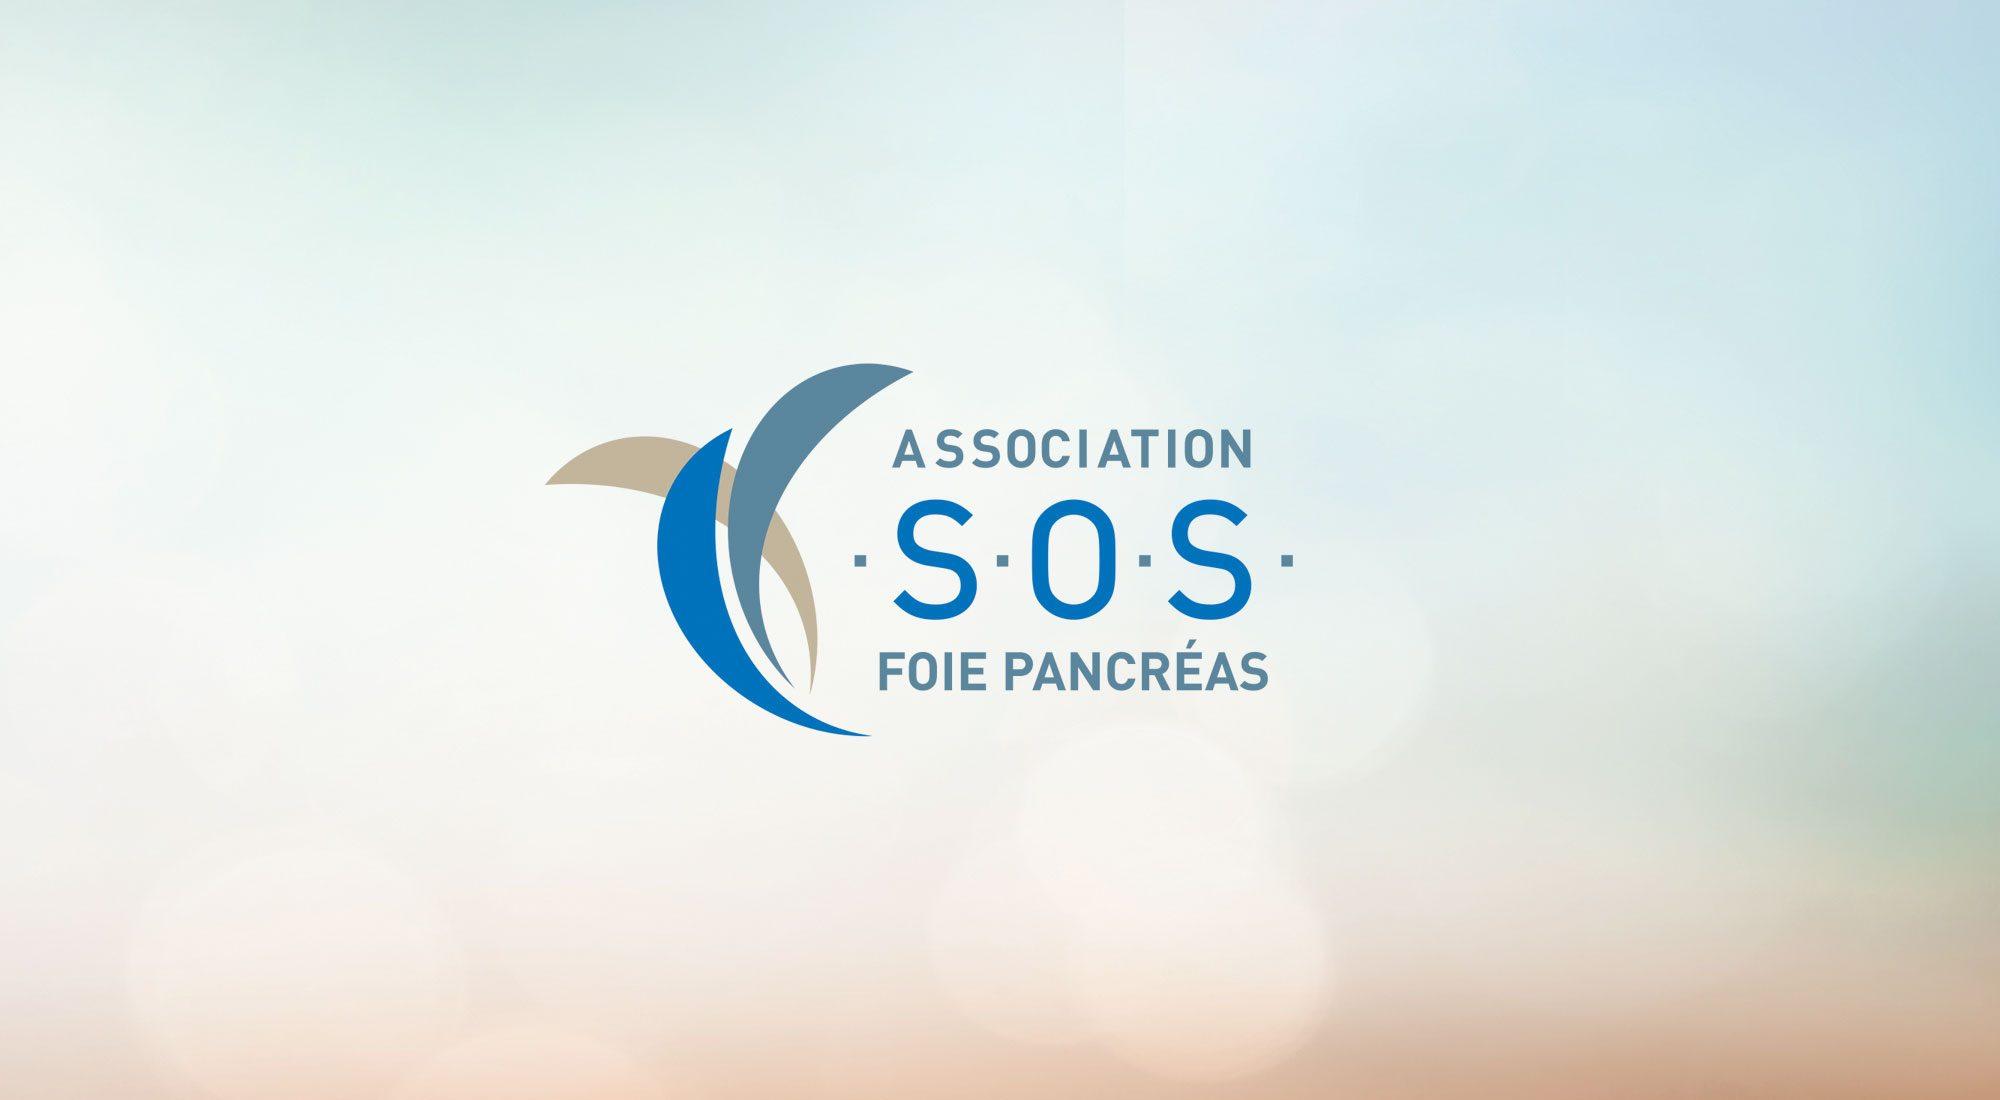 Chirurgie Foie Pancréas - Hôpital Strasbourg Hautepierre CHU - L'Association